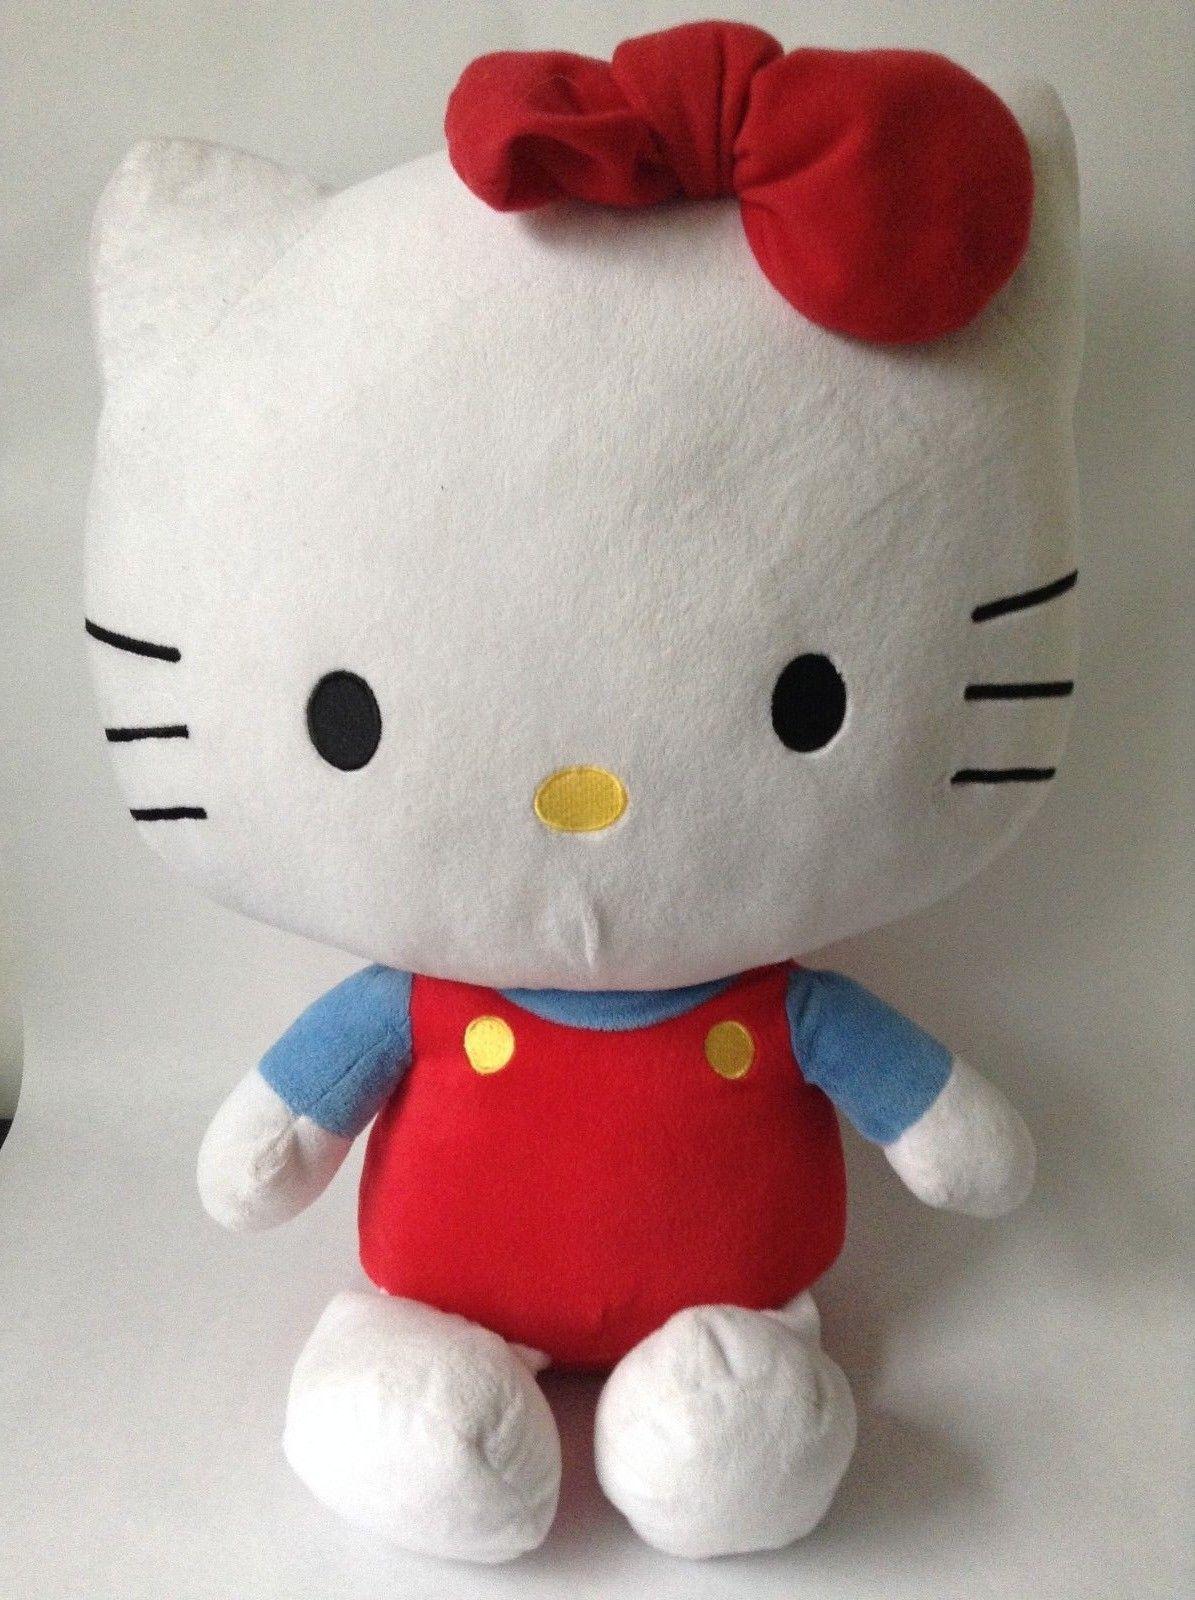 3c78a5ea7 Hello Kitty Plush Sanrio 2011 18